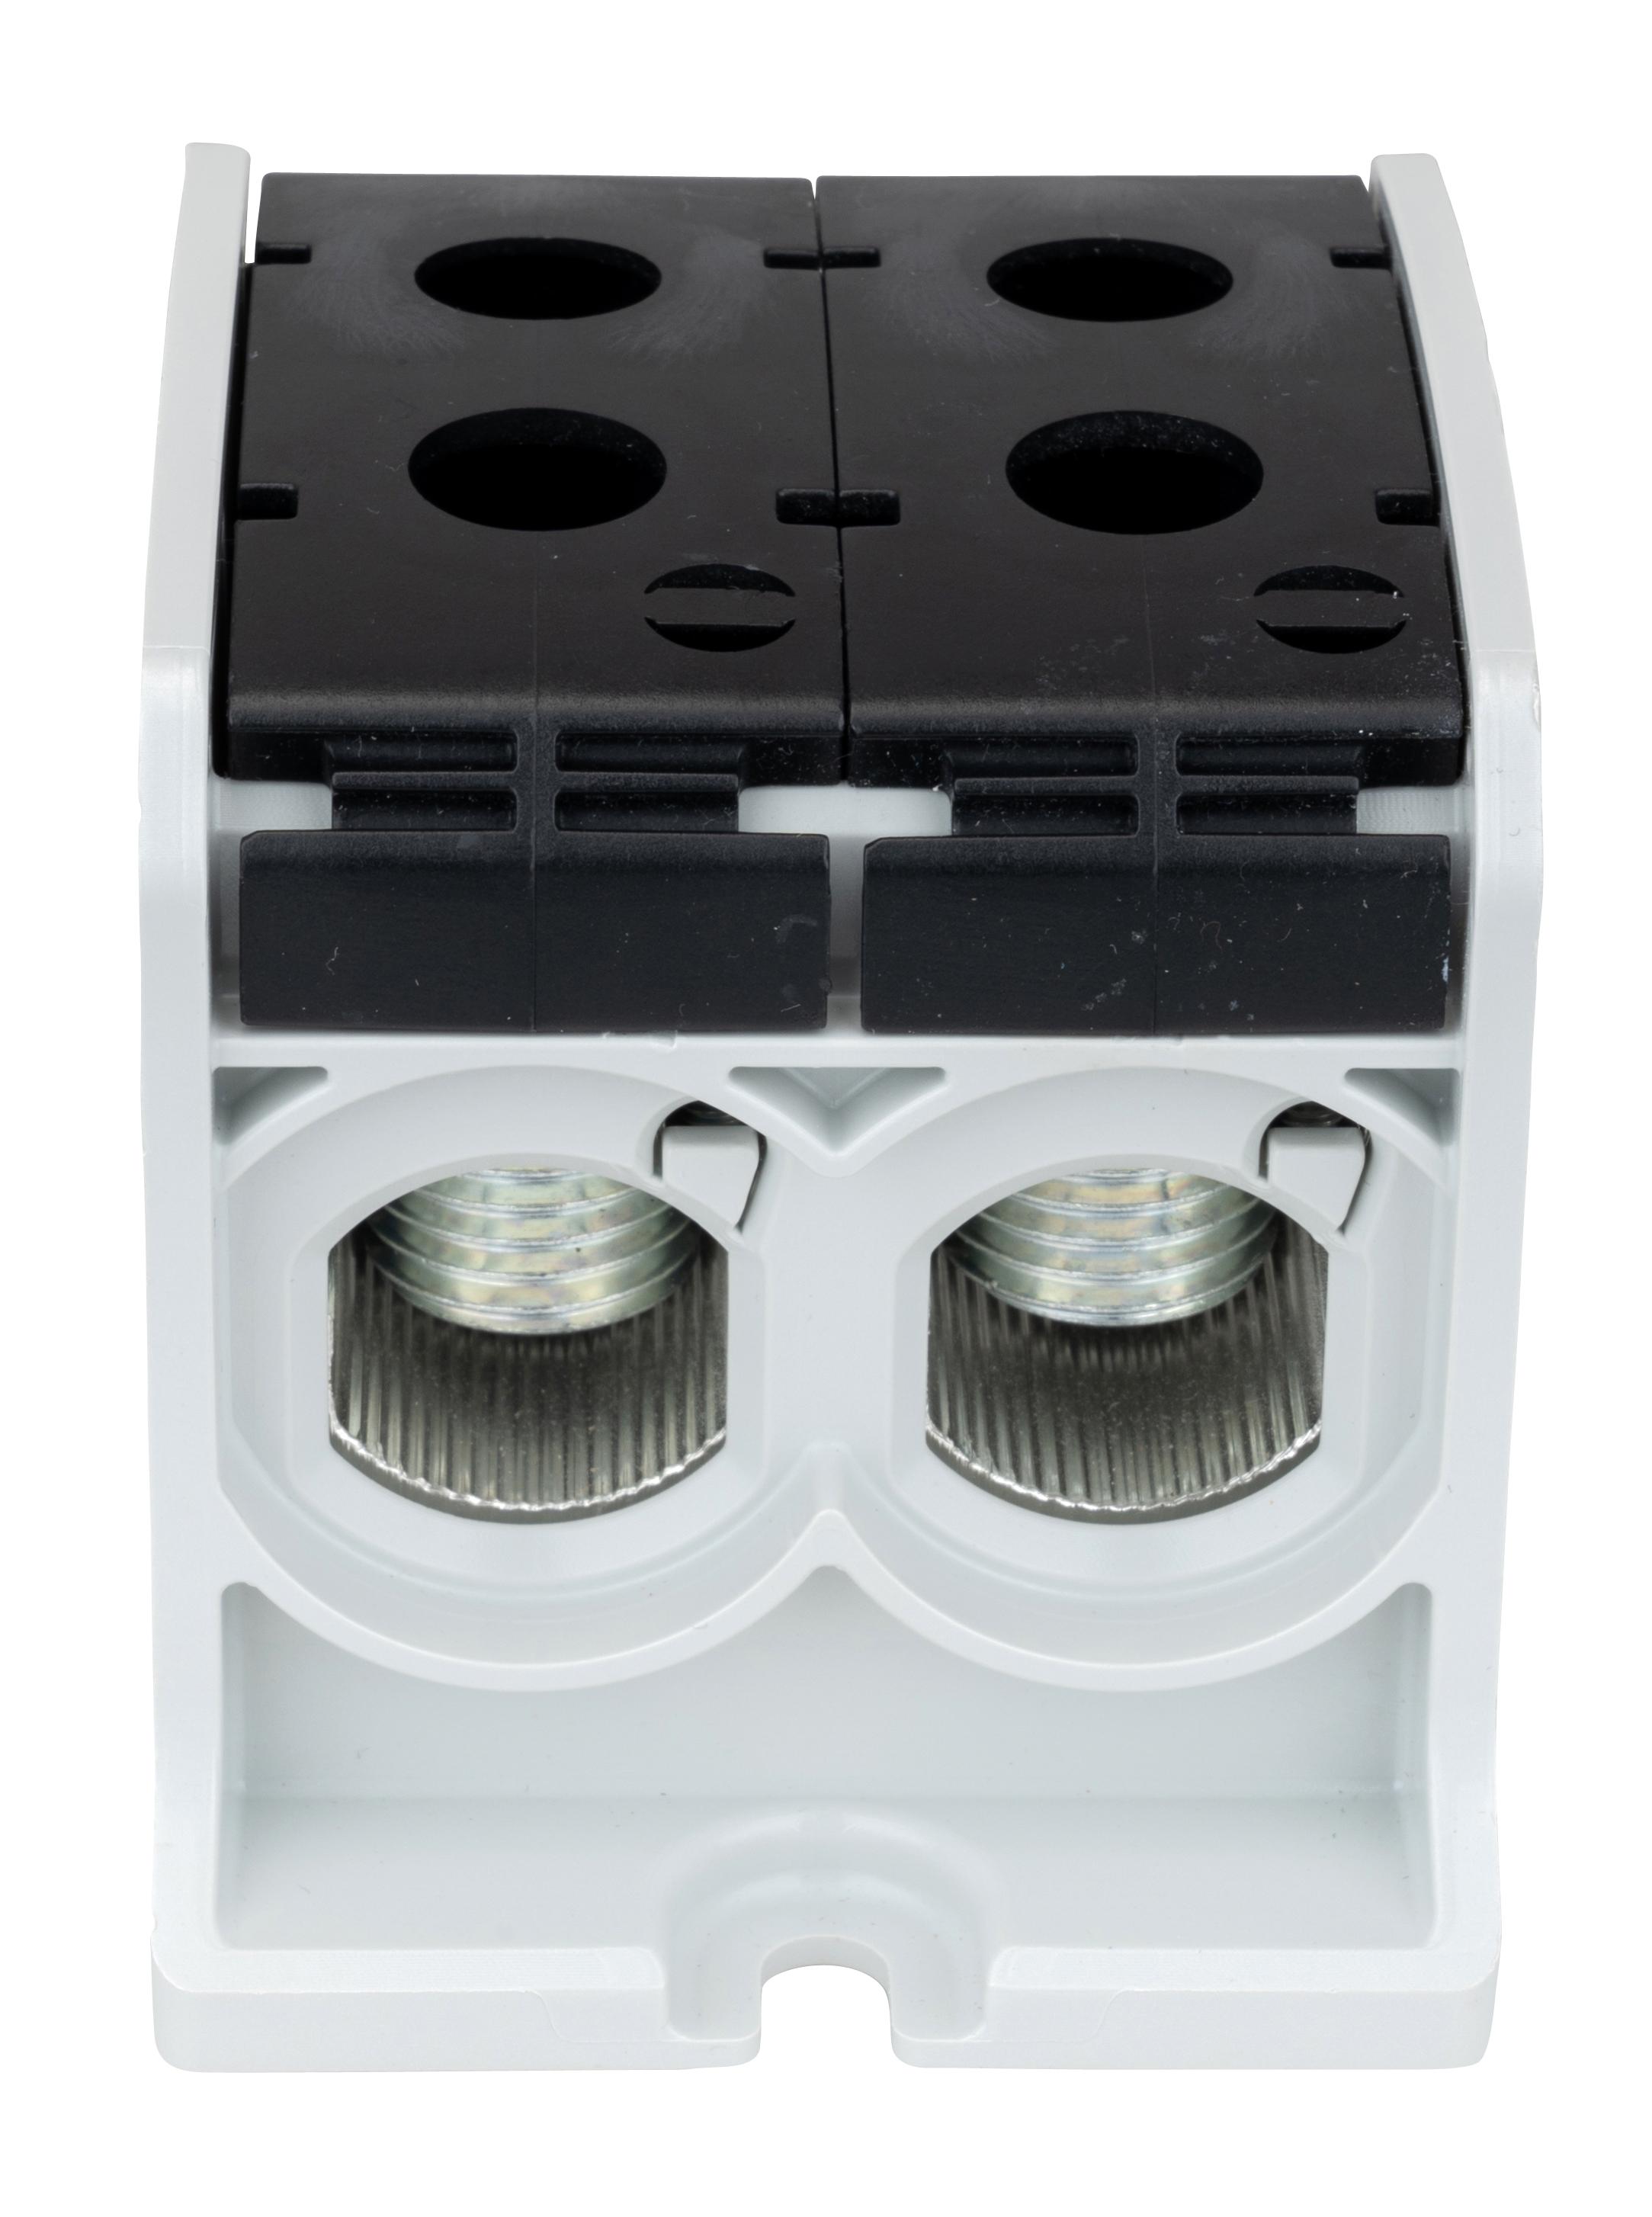 1 Stk Aluminium /Kupfer Klemme, 1-polig, Doppel 185mm² schwarz IKA21556--